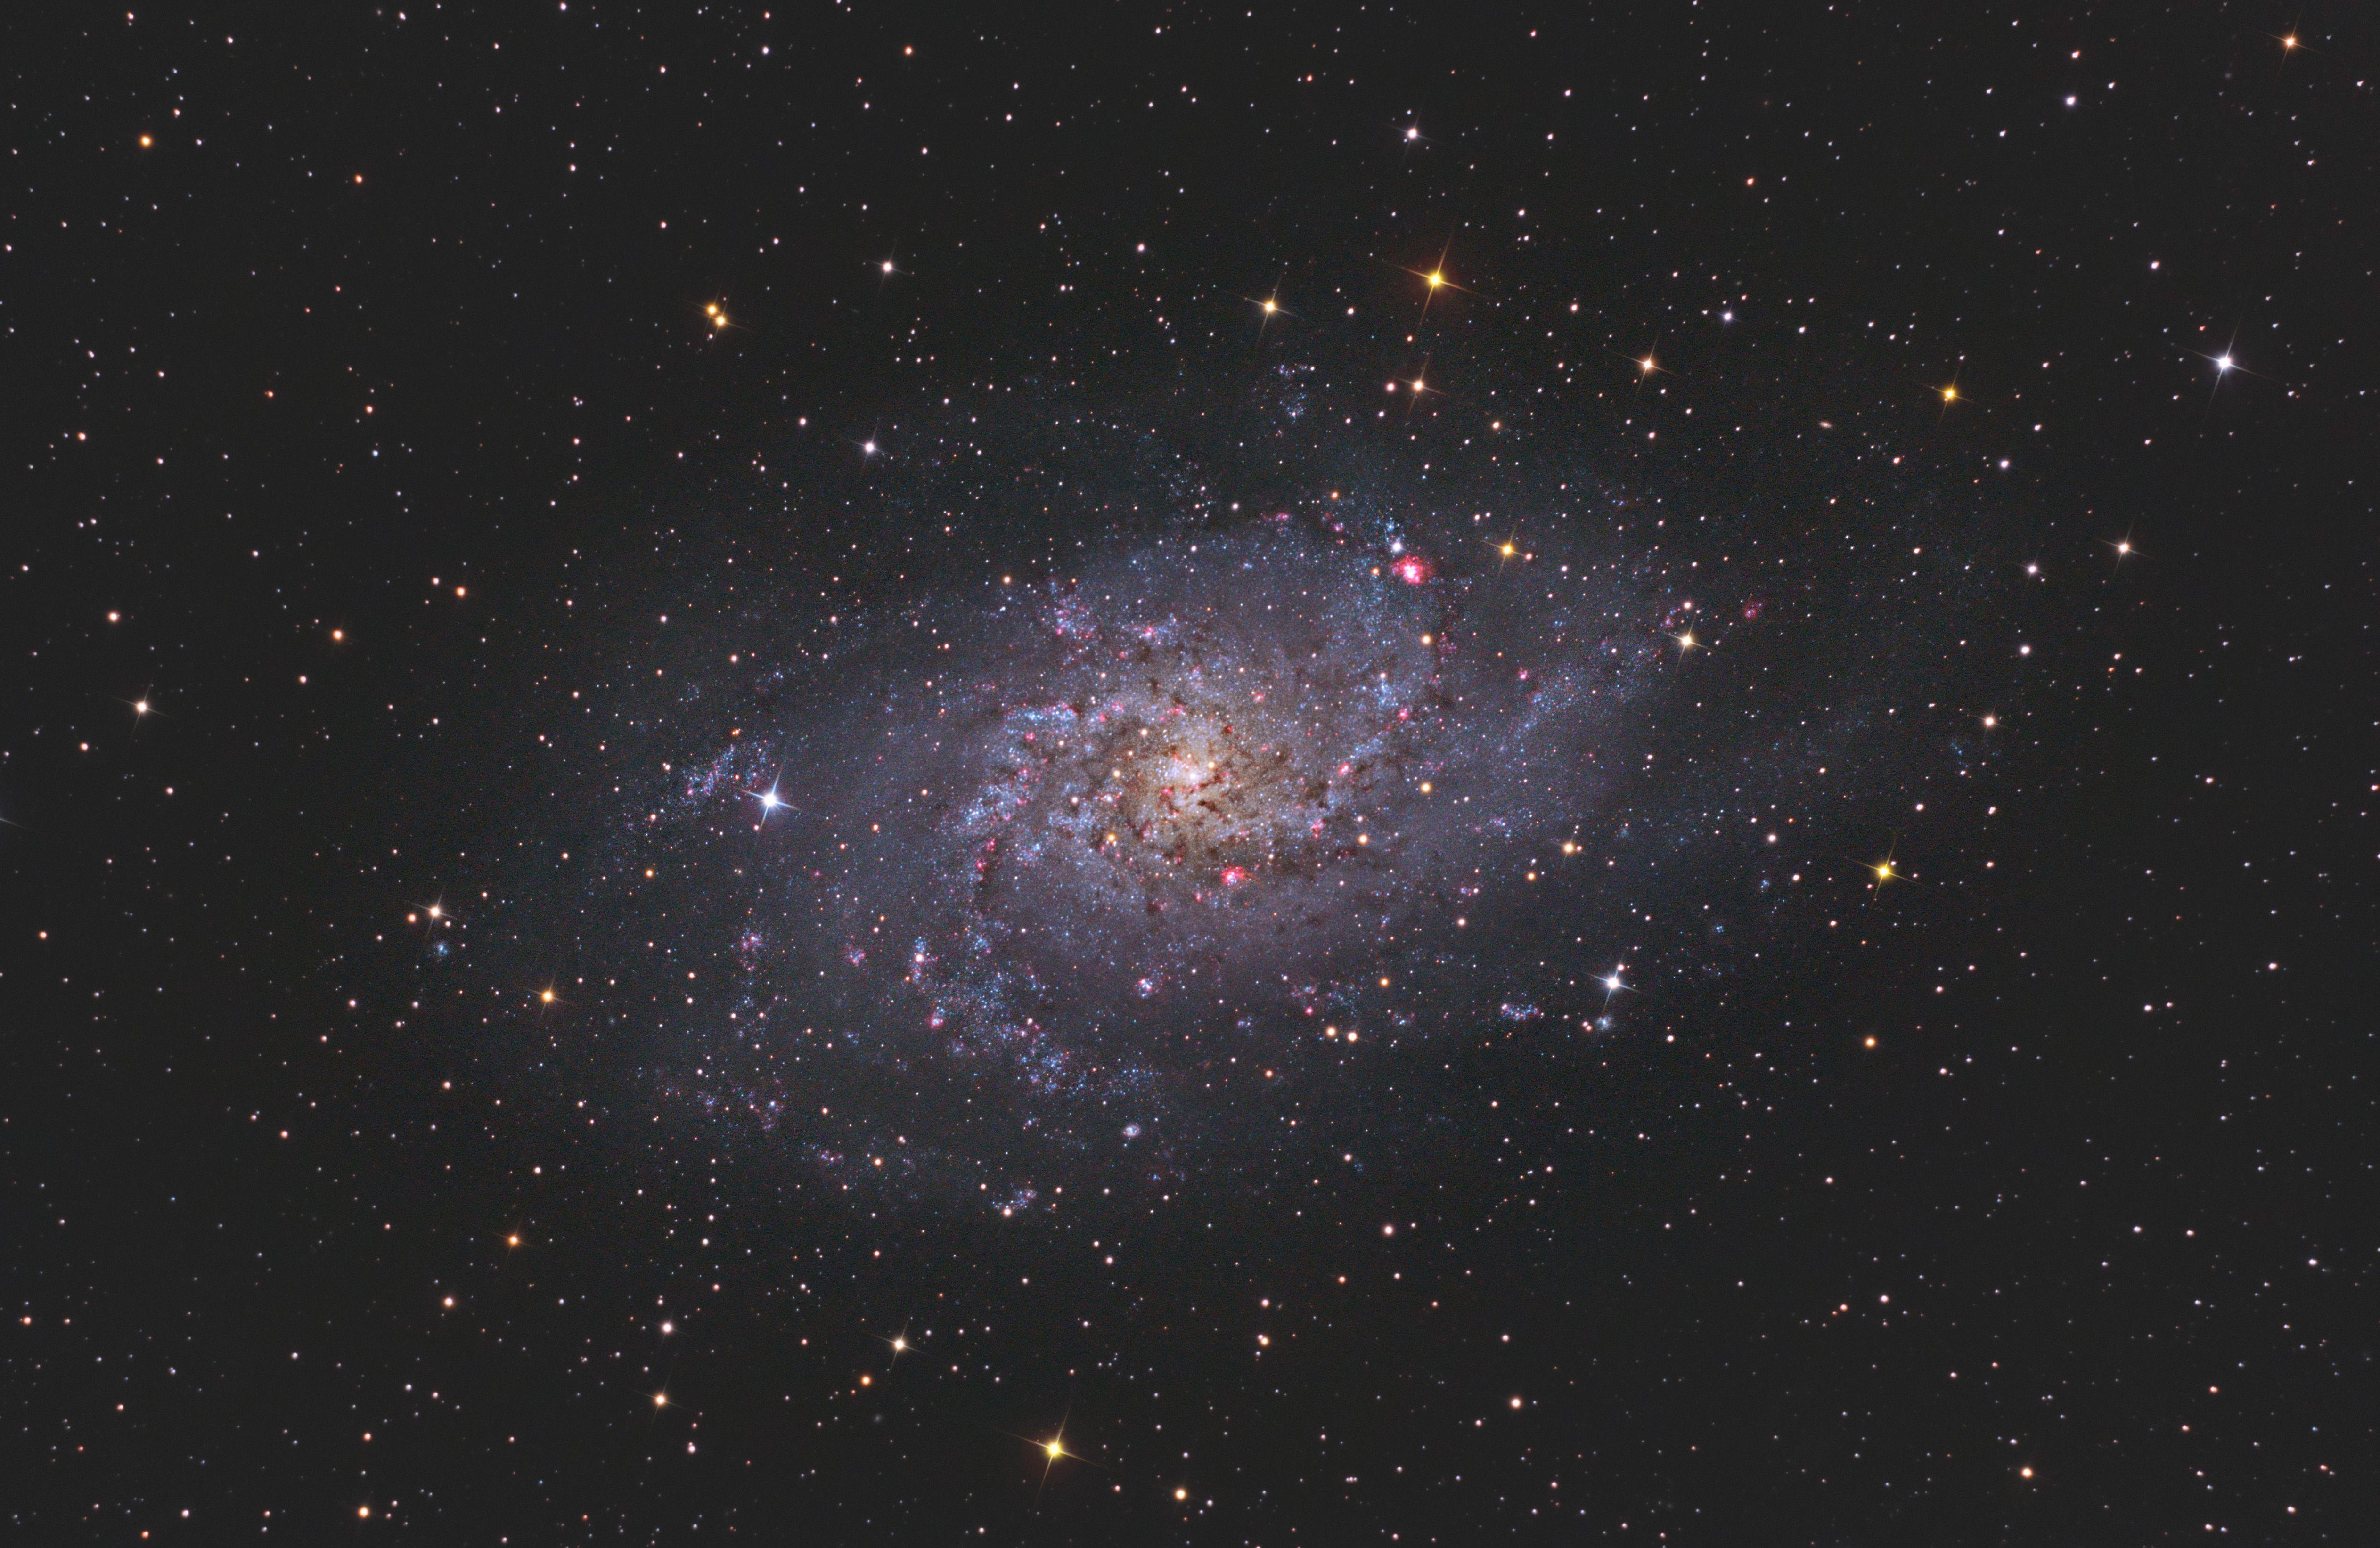 M33, Triangulum Galaxy by Christopher Gomez